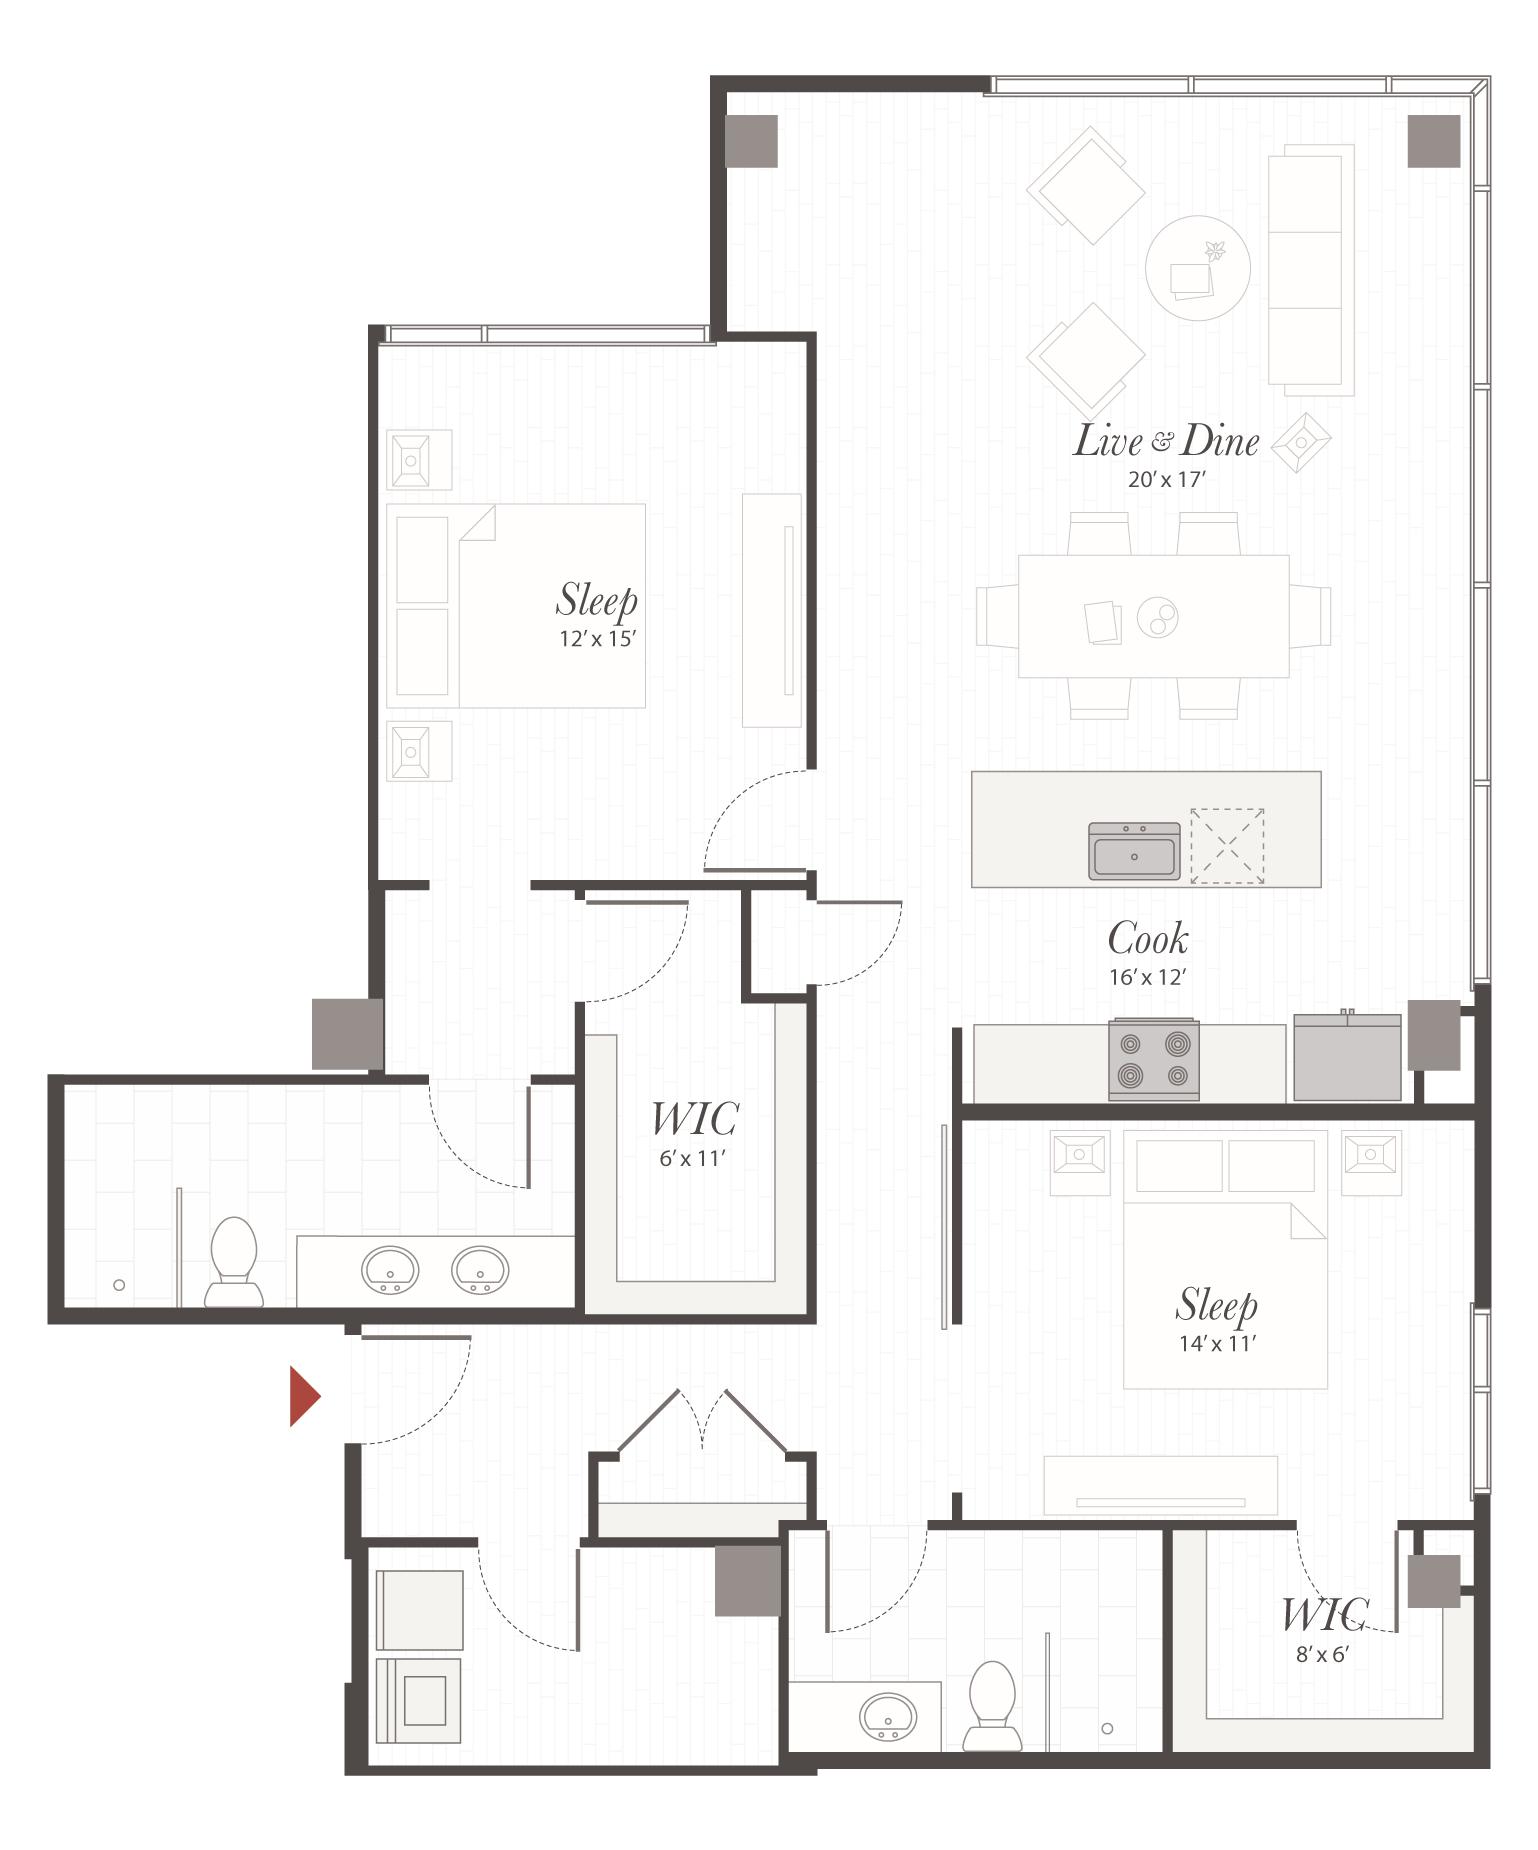 P4 - 2 Bedroom Apartment Cincinnati | Encore Apartments